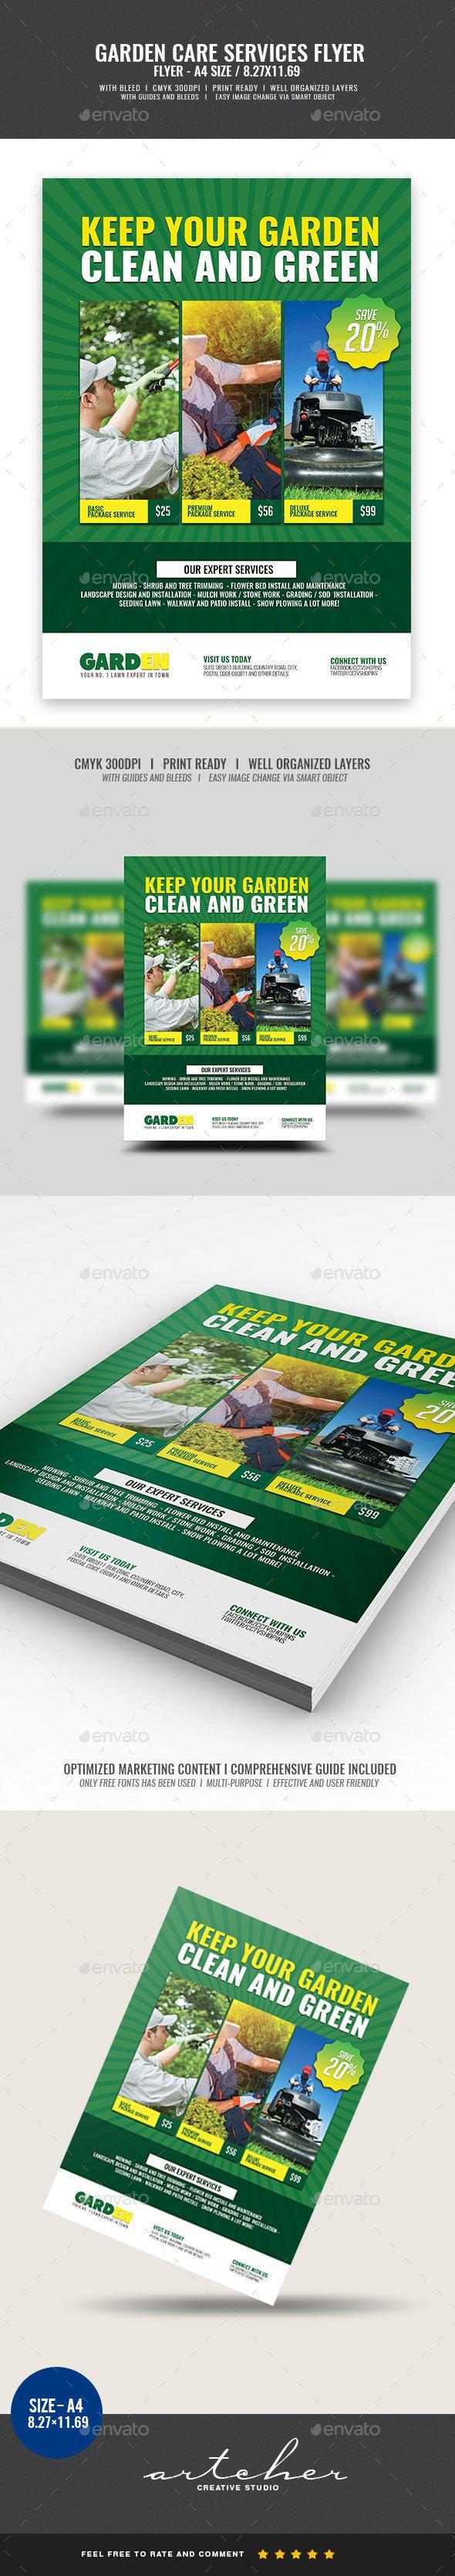 Landscaping Services Flyer V2 Pinterest Flyer Template Template